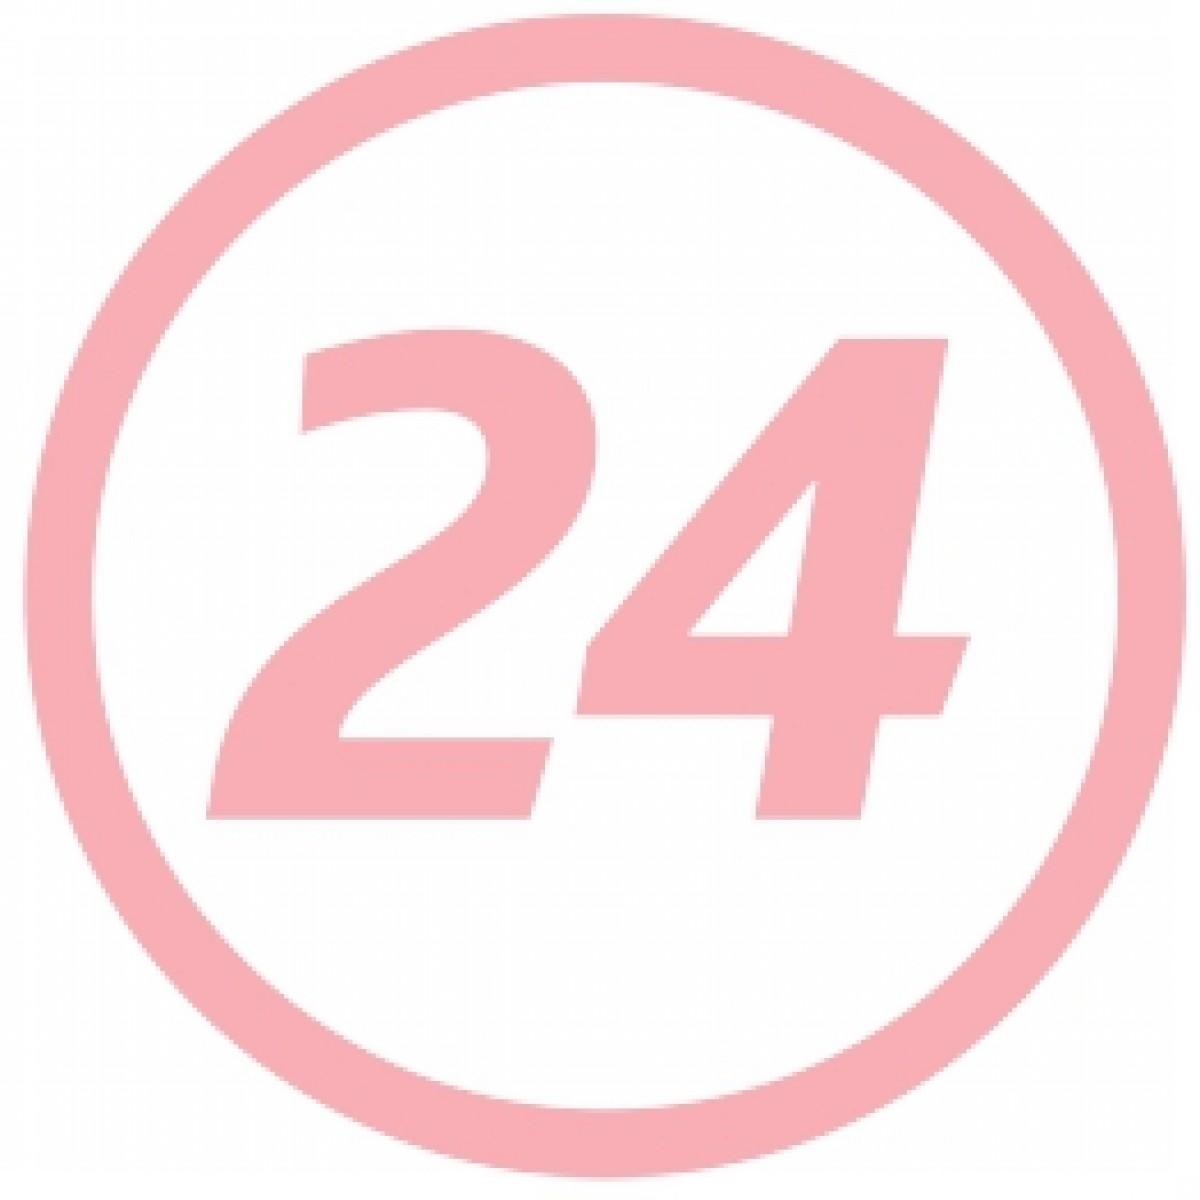 Pachet Mustela Maternite Ser Pentru Corectia Vergeturilor, Ser, 45ml 1+1 GRATIS